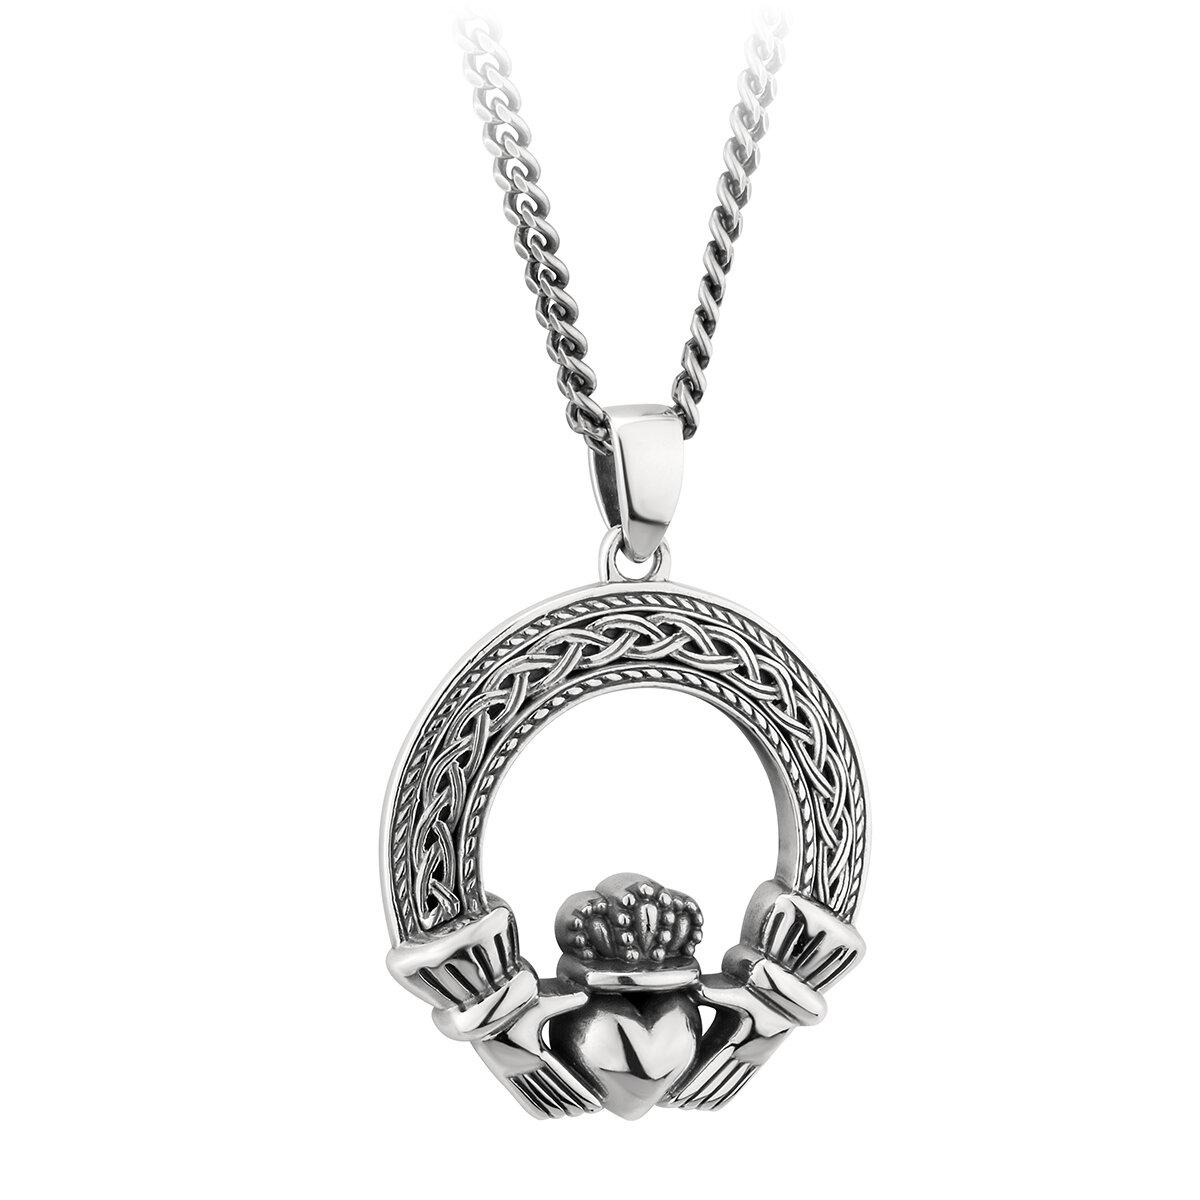 sterling silver celtic claddagh pendant s46452 from Solvar